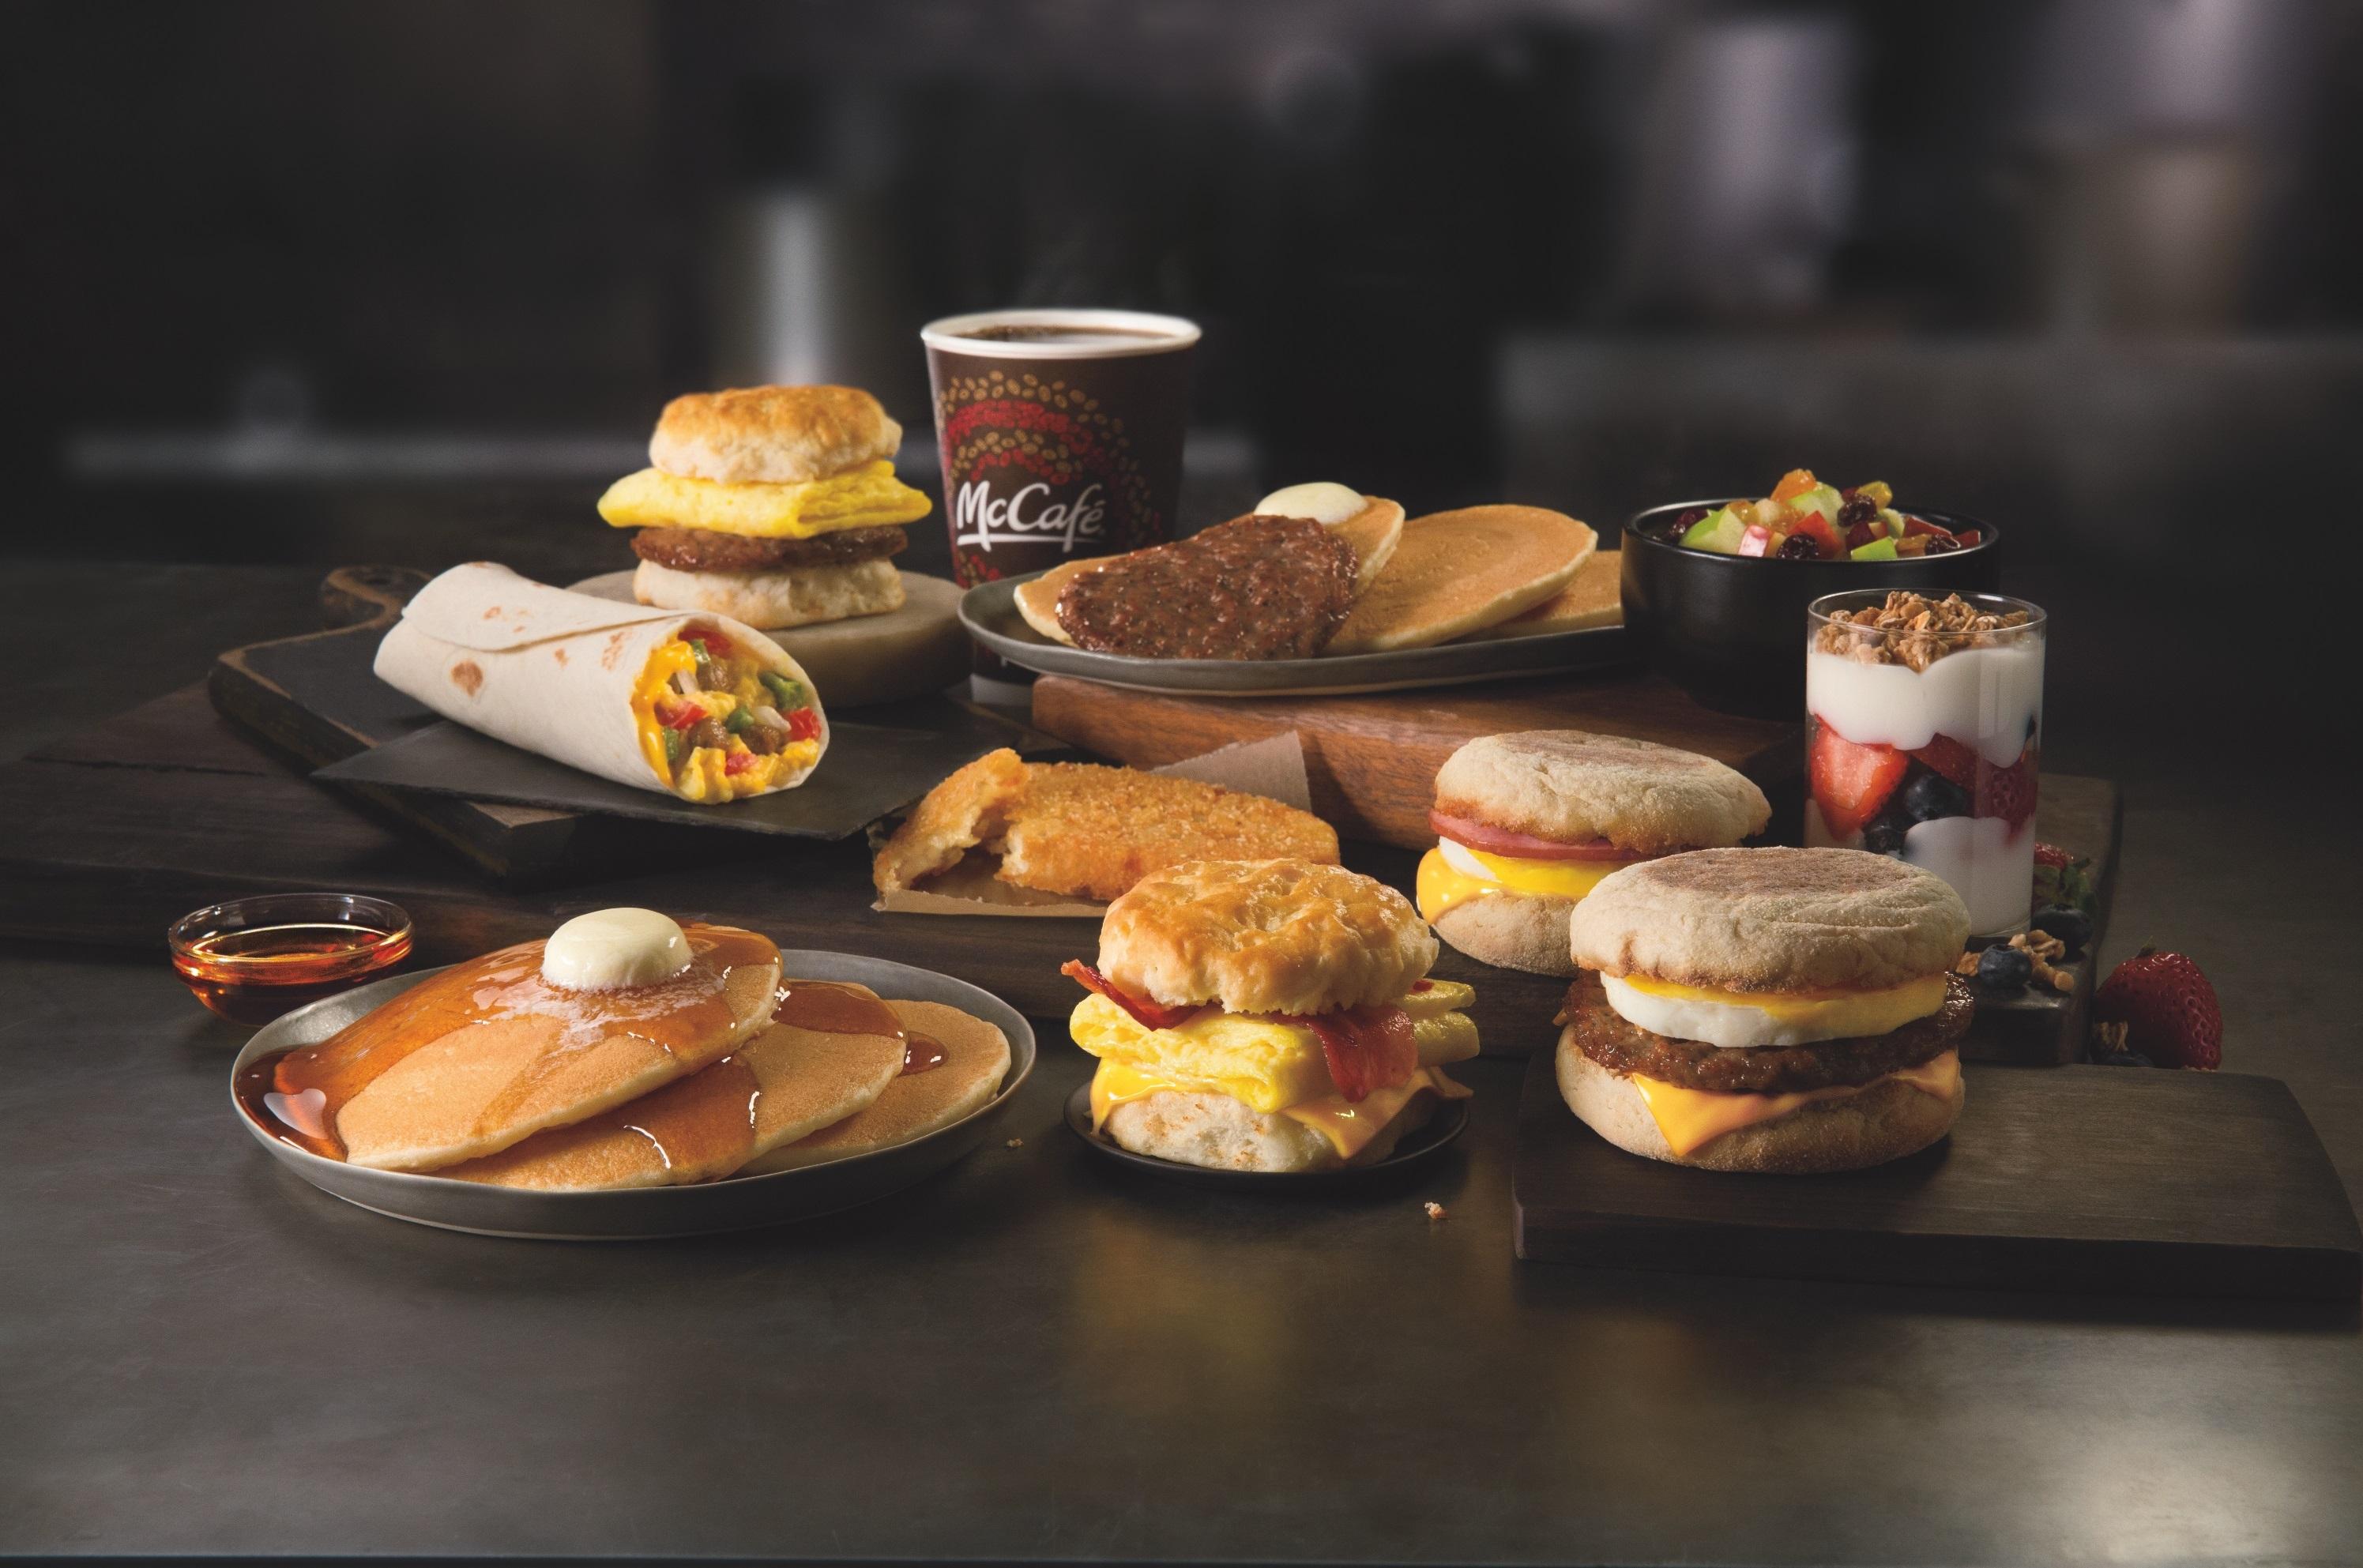 McDonald's All Day Breakfast Menu Details